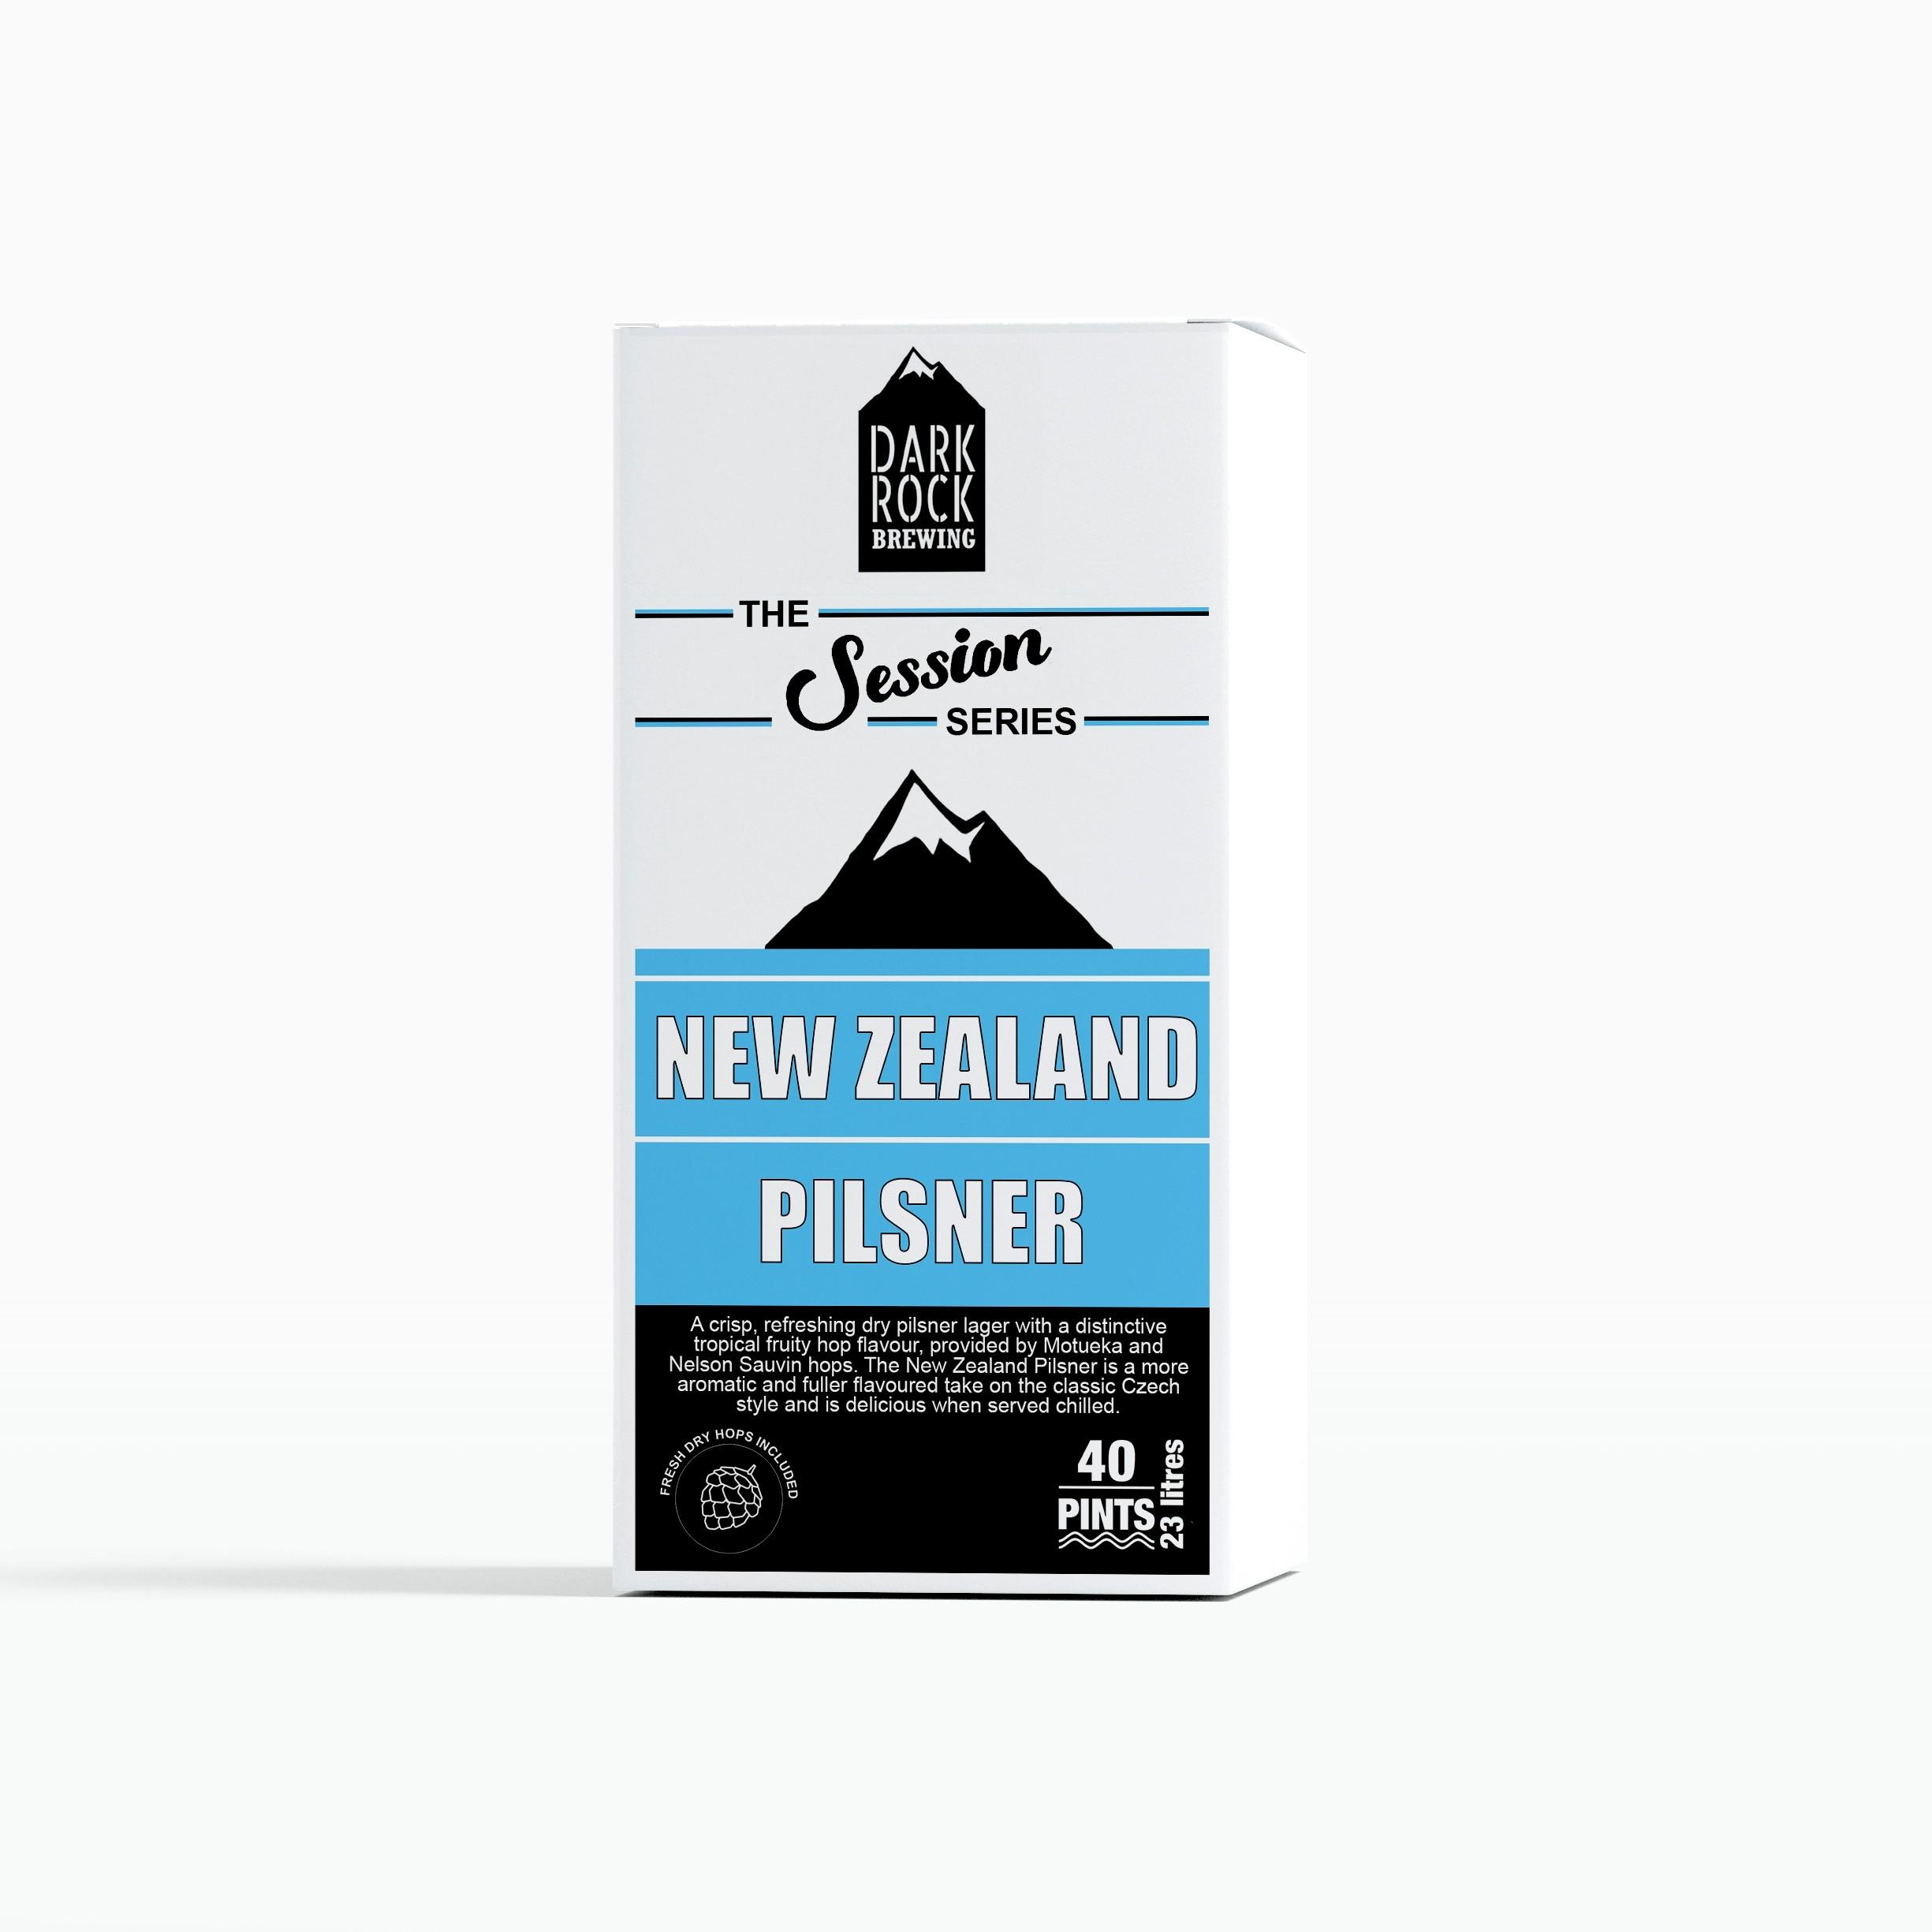 Dark Rock Session Series - New Zealand Pilsner